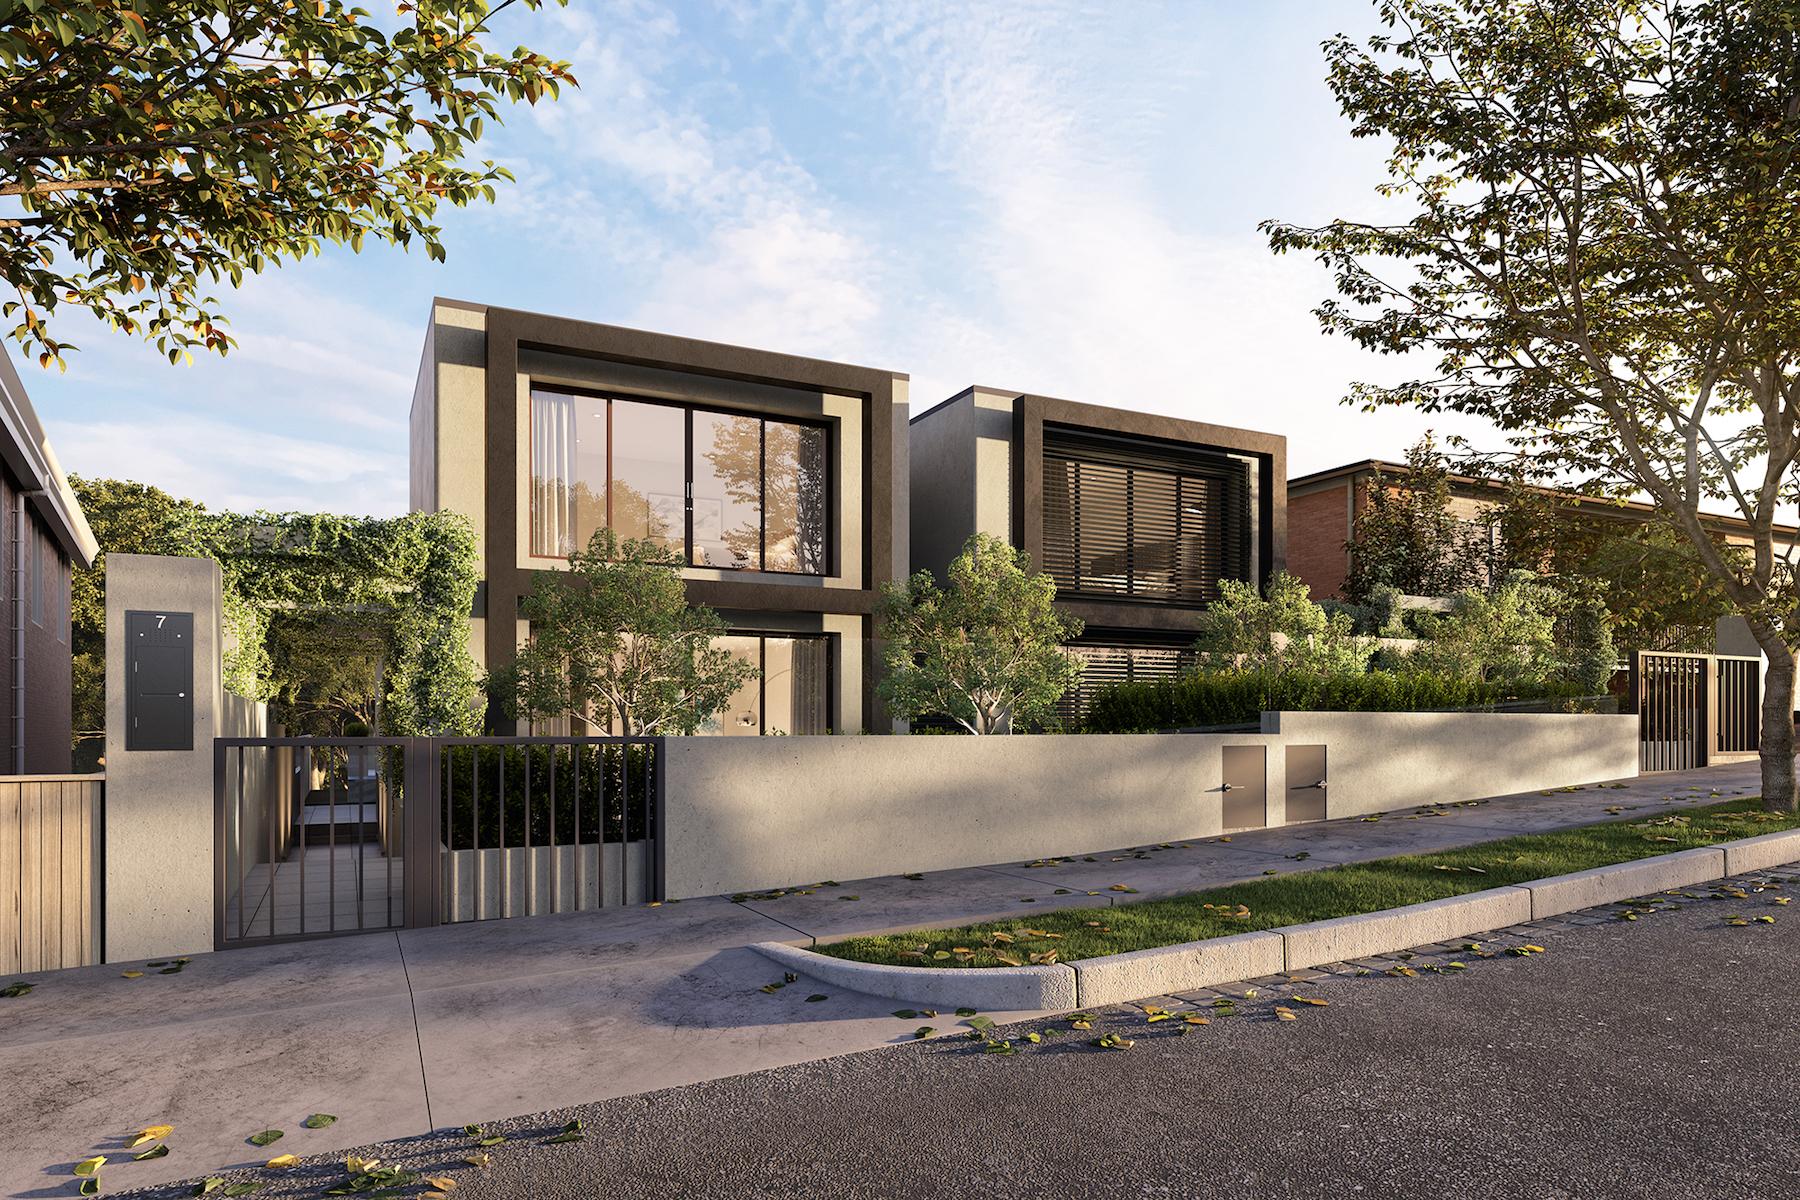 Konak için Satış at 1&2/7 Monomeath Avenue, Toorak Melbourne, Victoria, 3142 Avustralya